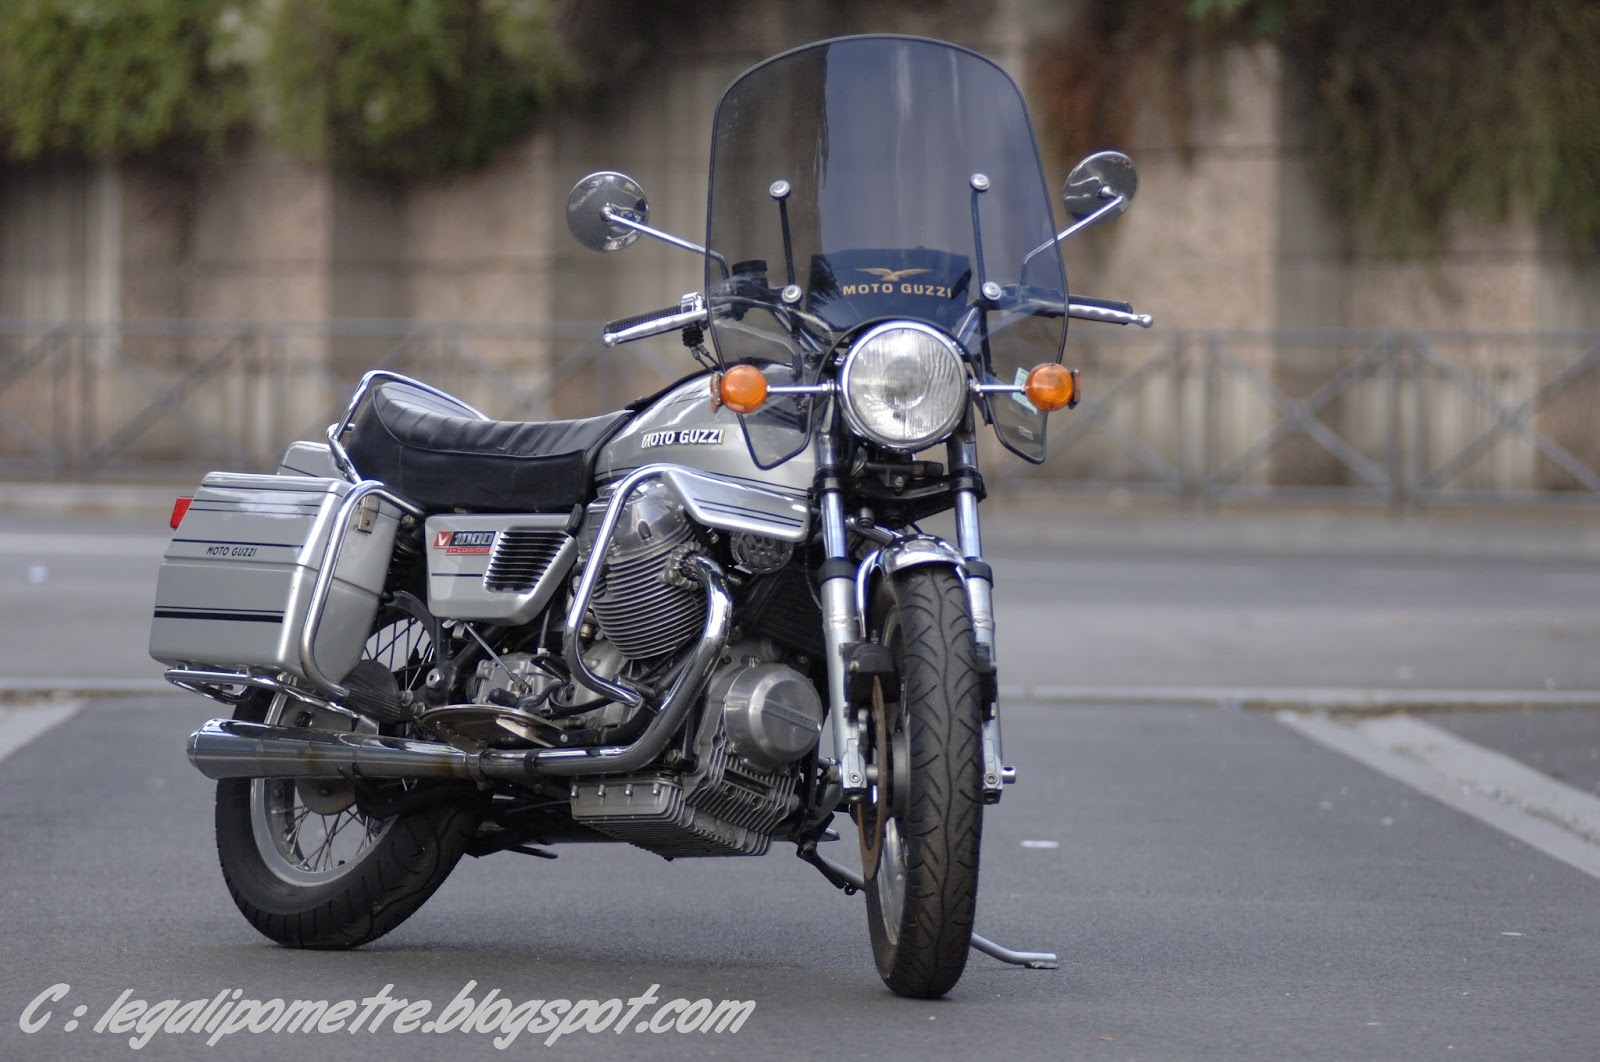 Le Galipomètre: Contact : Moto Guzzi 1000 Convert 1976